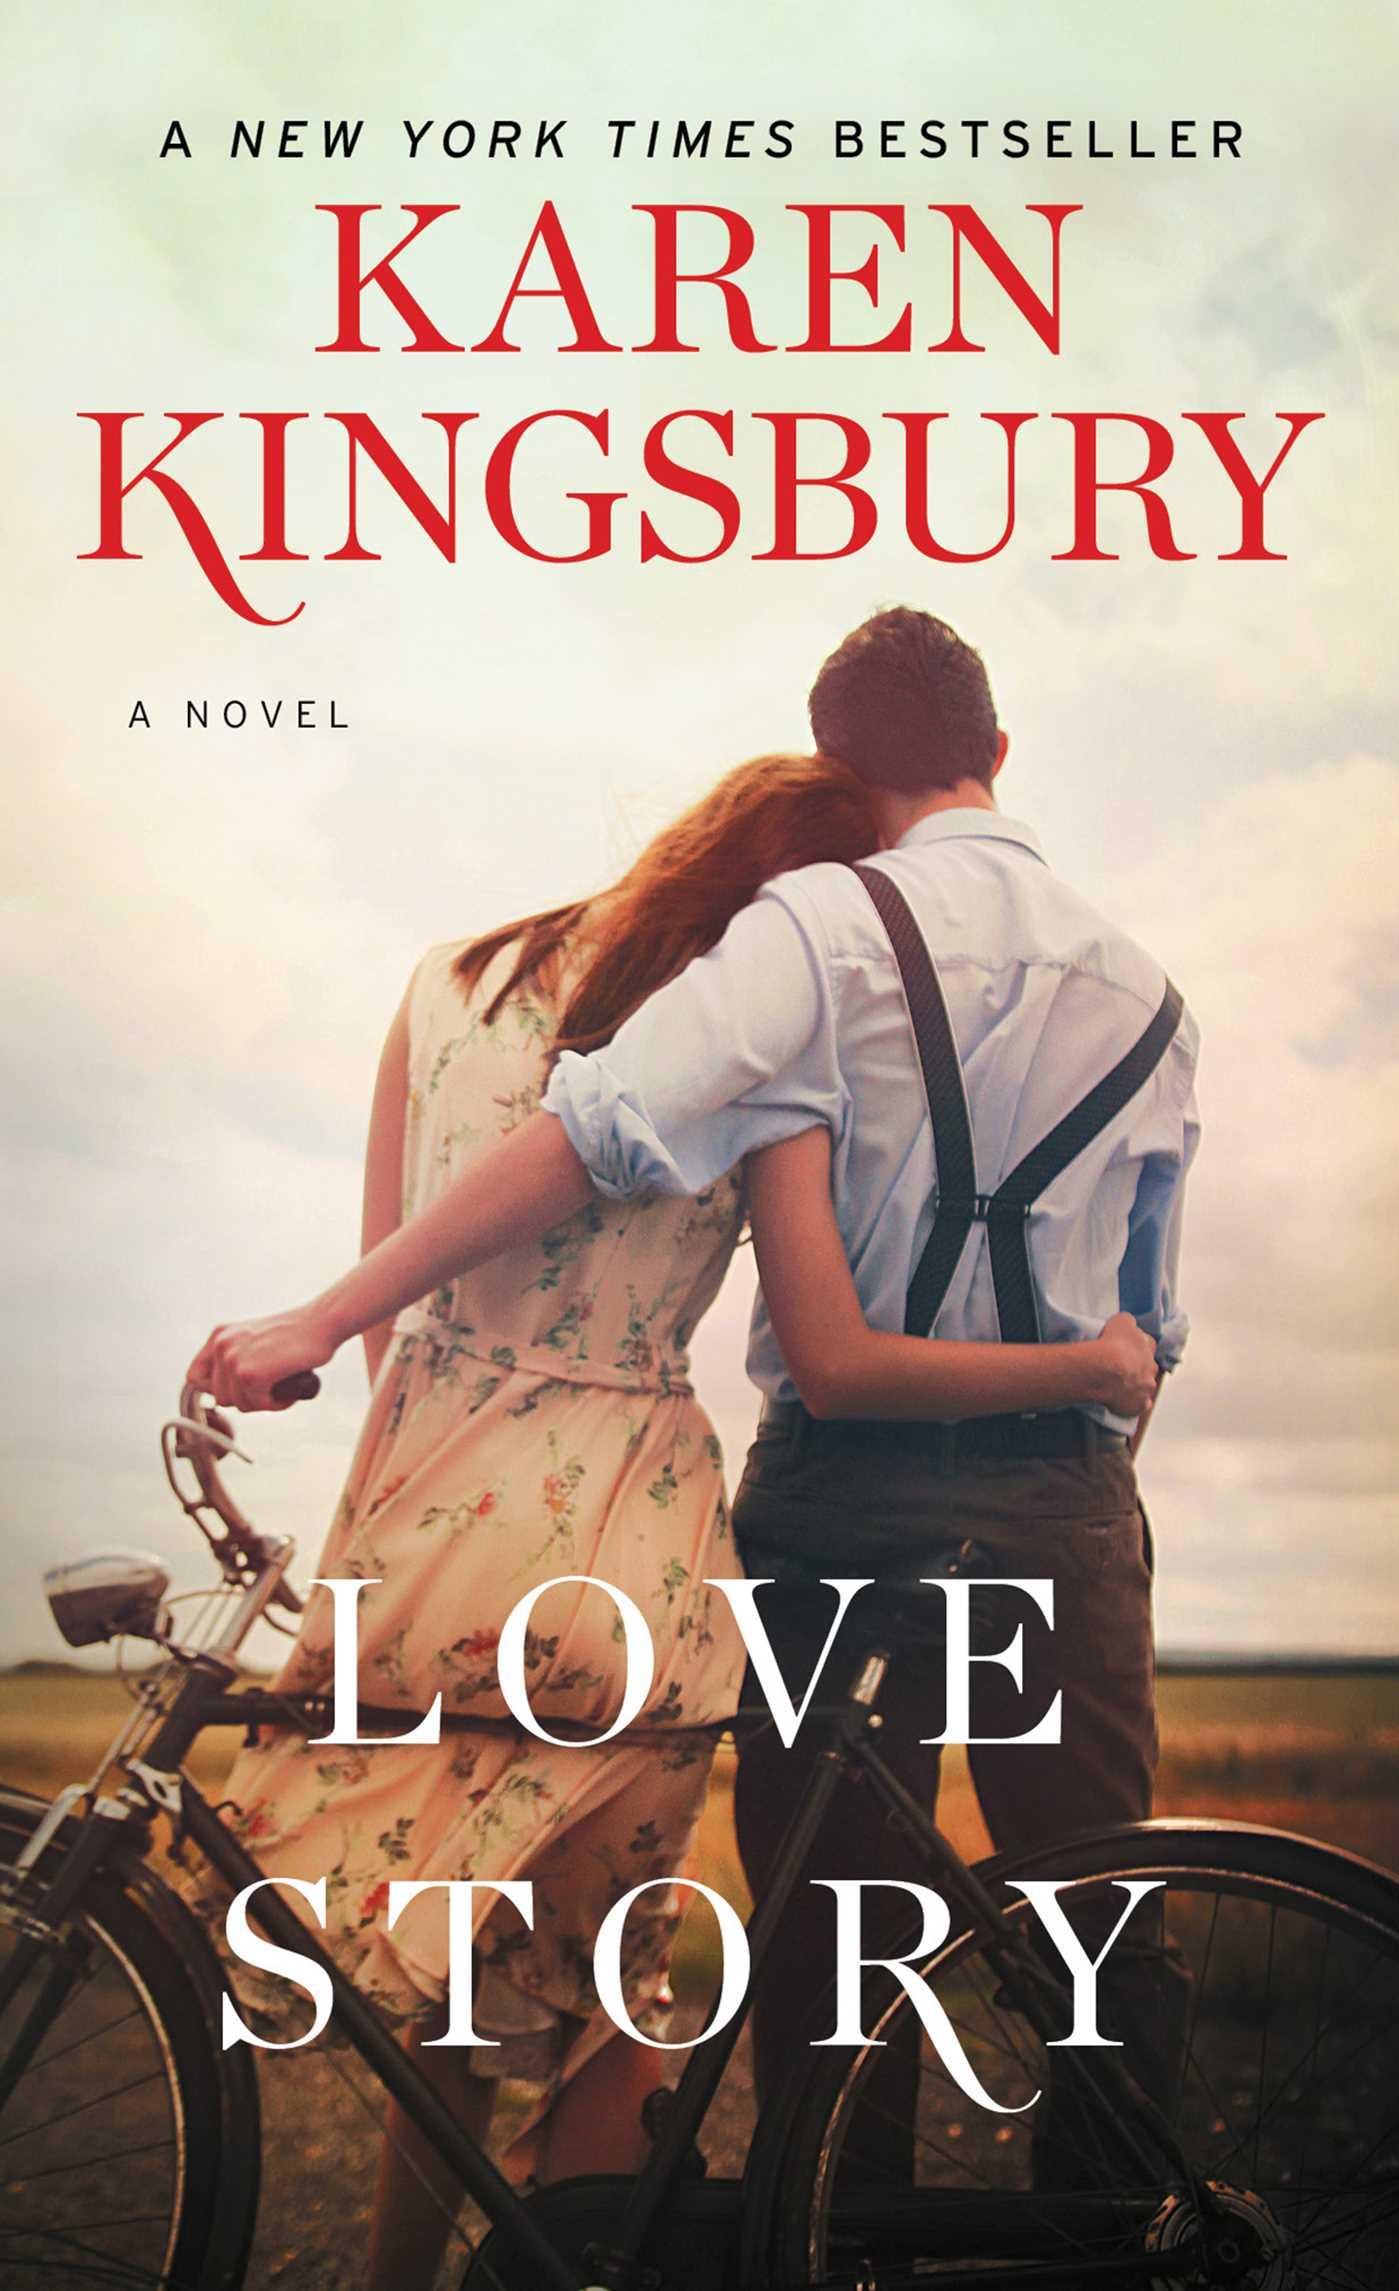 Love story [eBook] : a novel